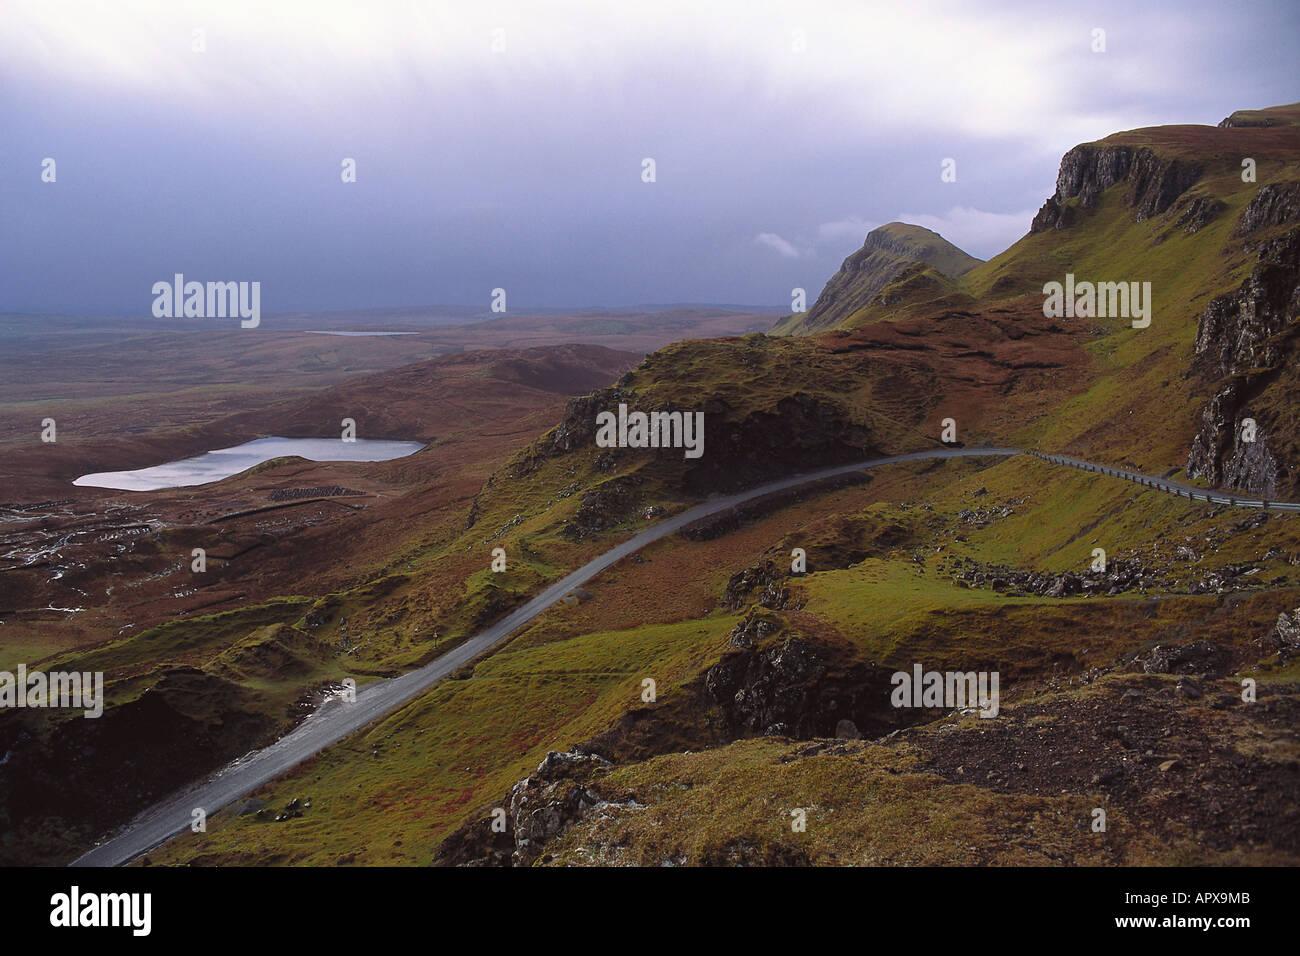 The Storr, Isle of Skye Scotland - Stock Image